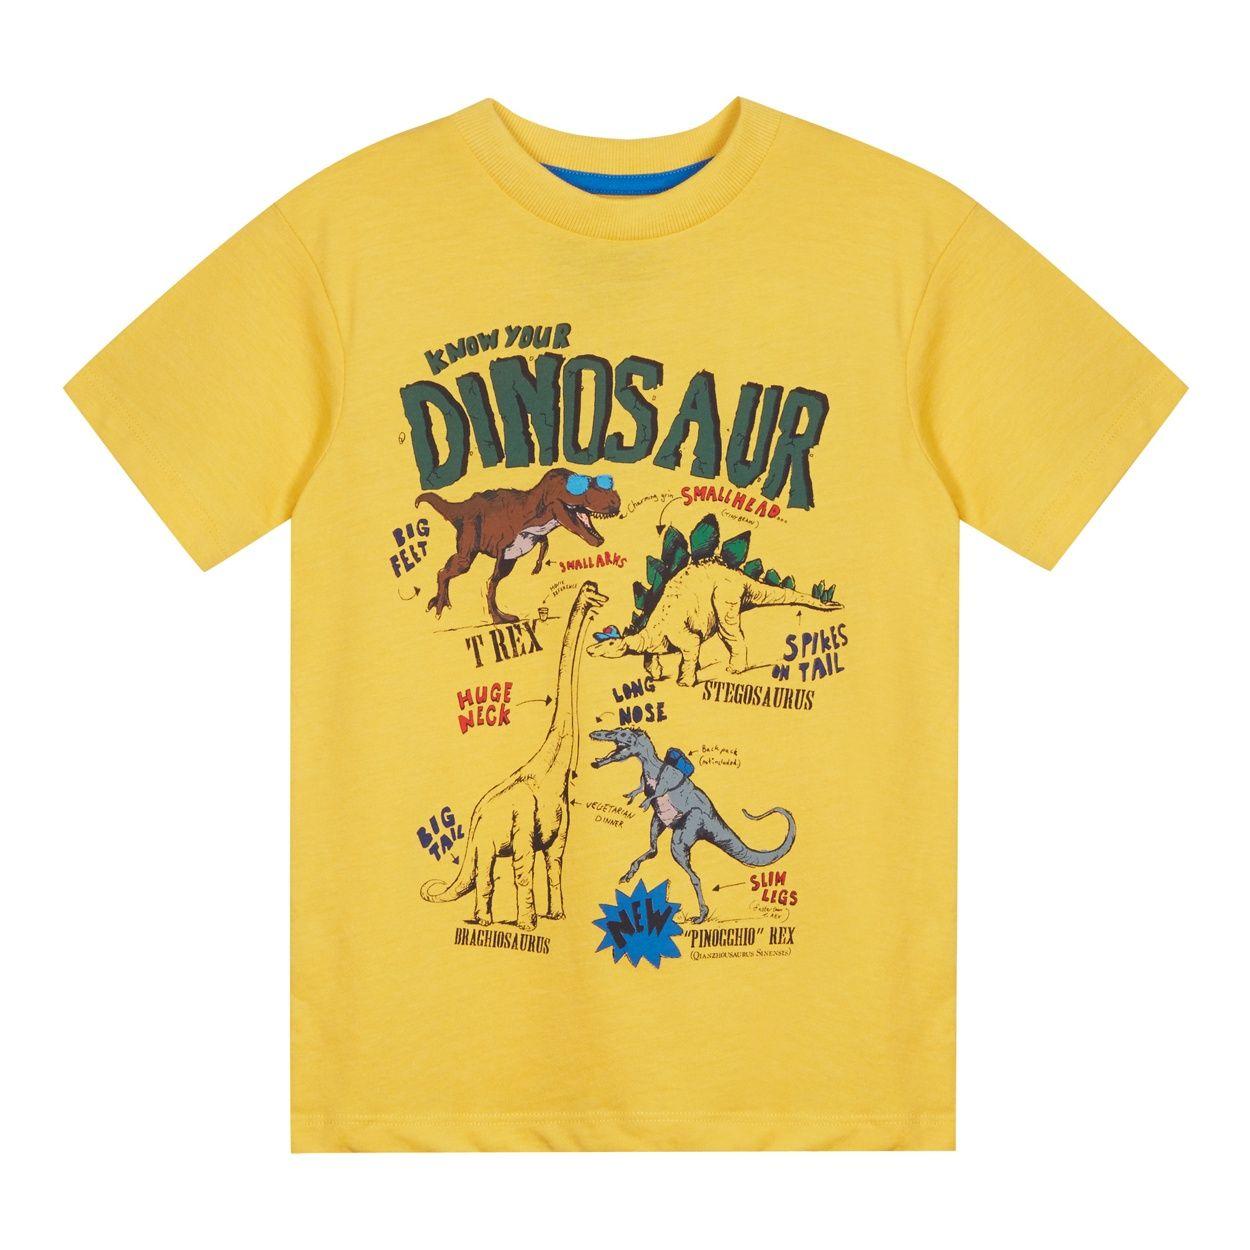 Boy S Yellow Dinosaur T Shirt At Debenhams Com Shirts T Shirt Boys T Shirts [ 1250 x 1250 Pixel ]